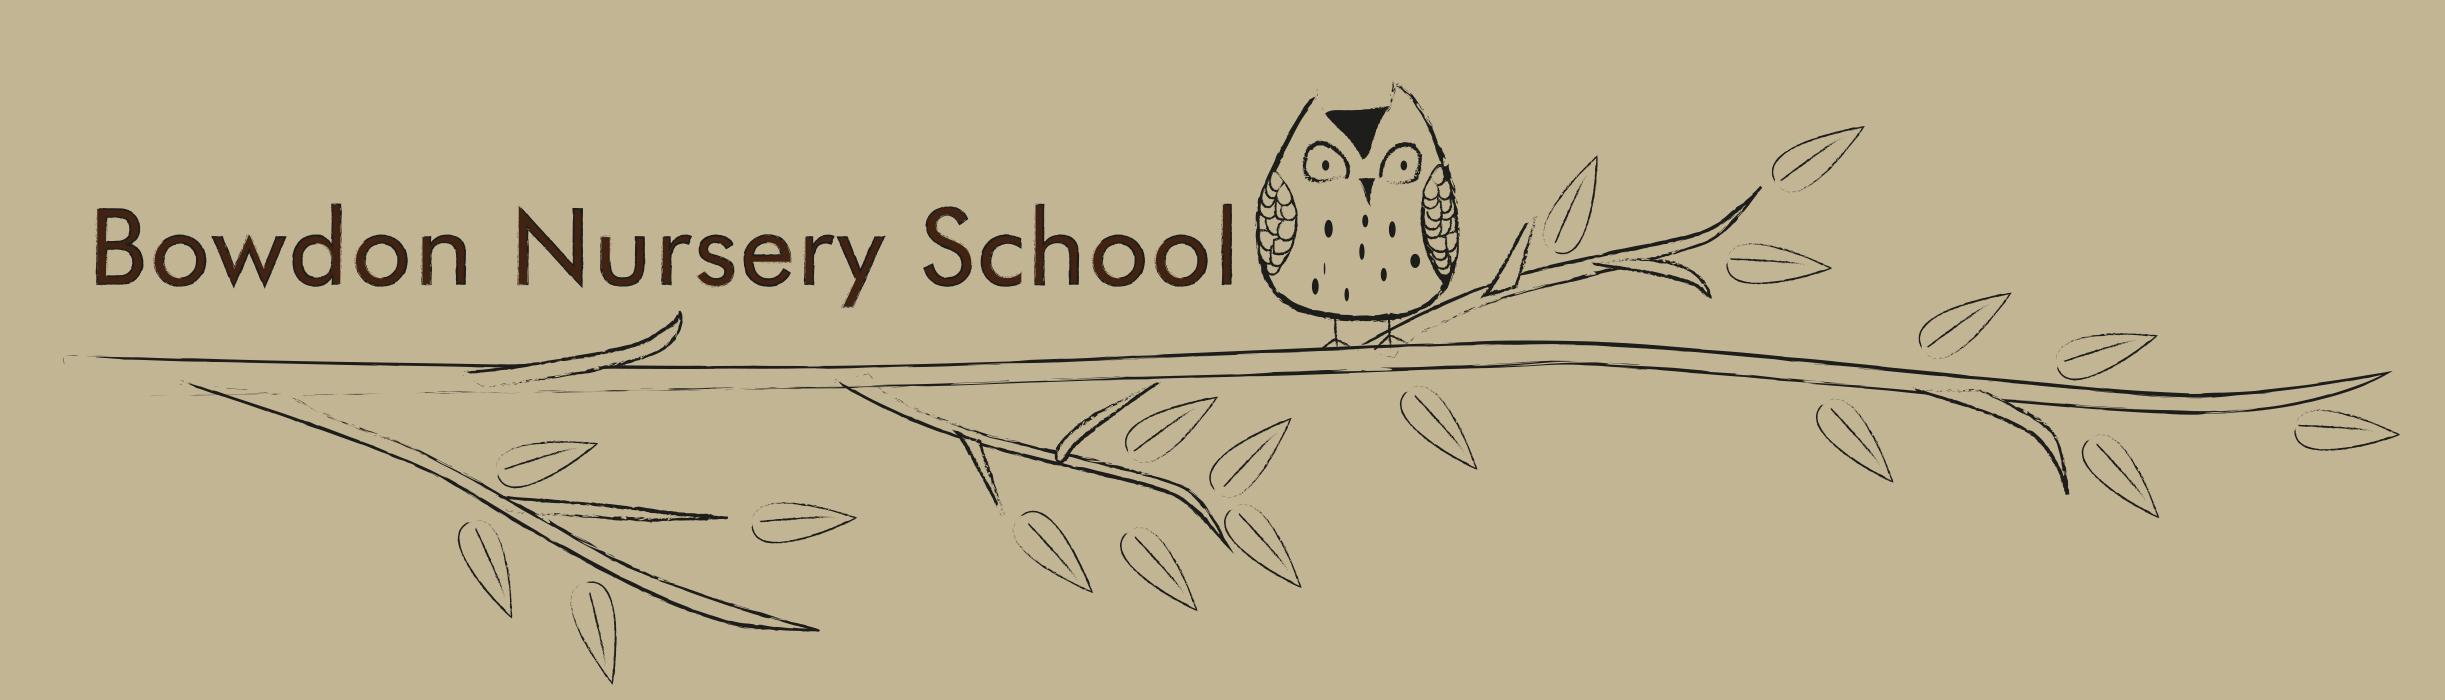 bowdon nursery school logo.jpg